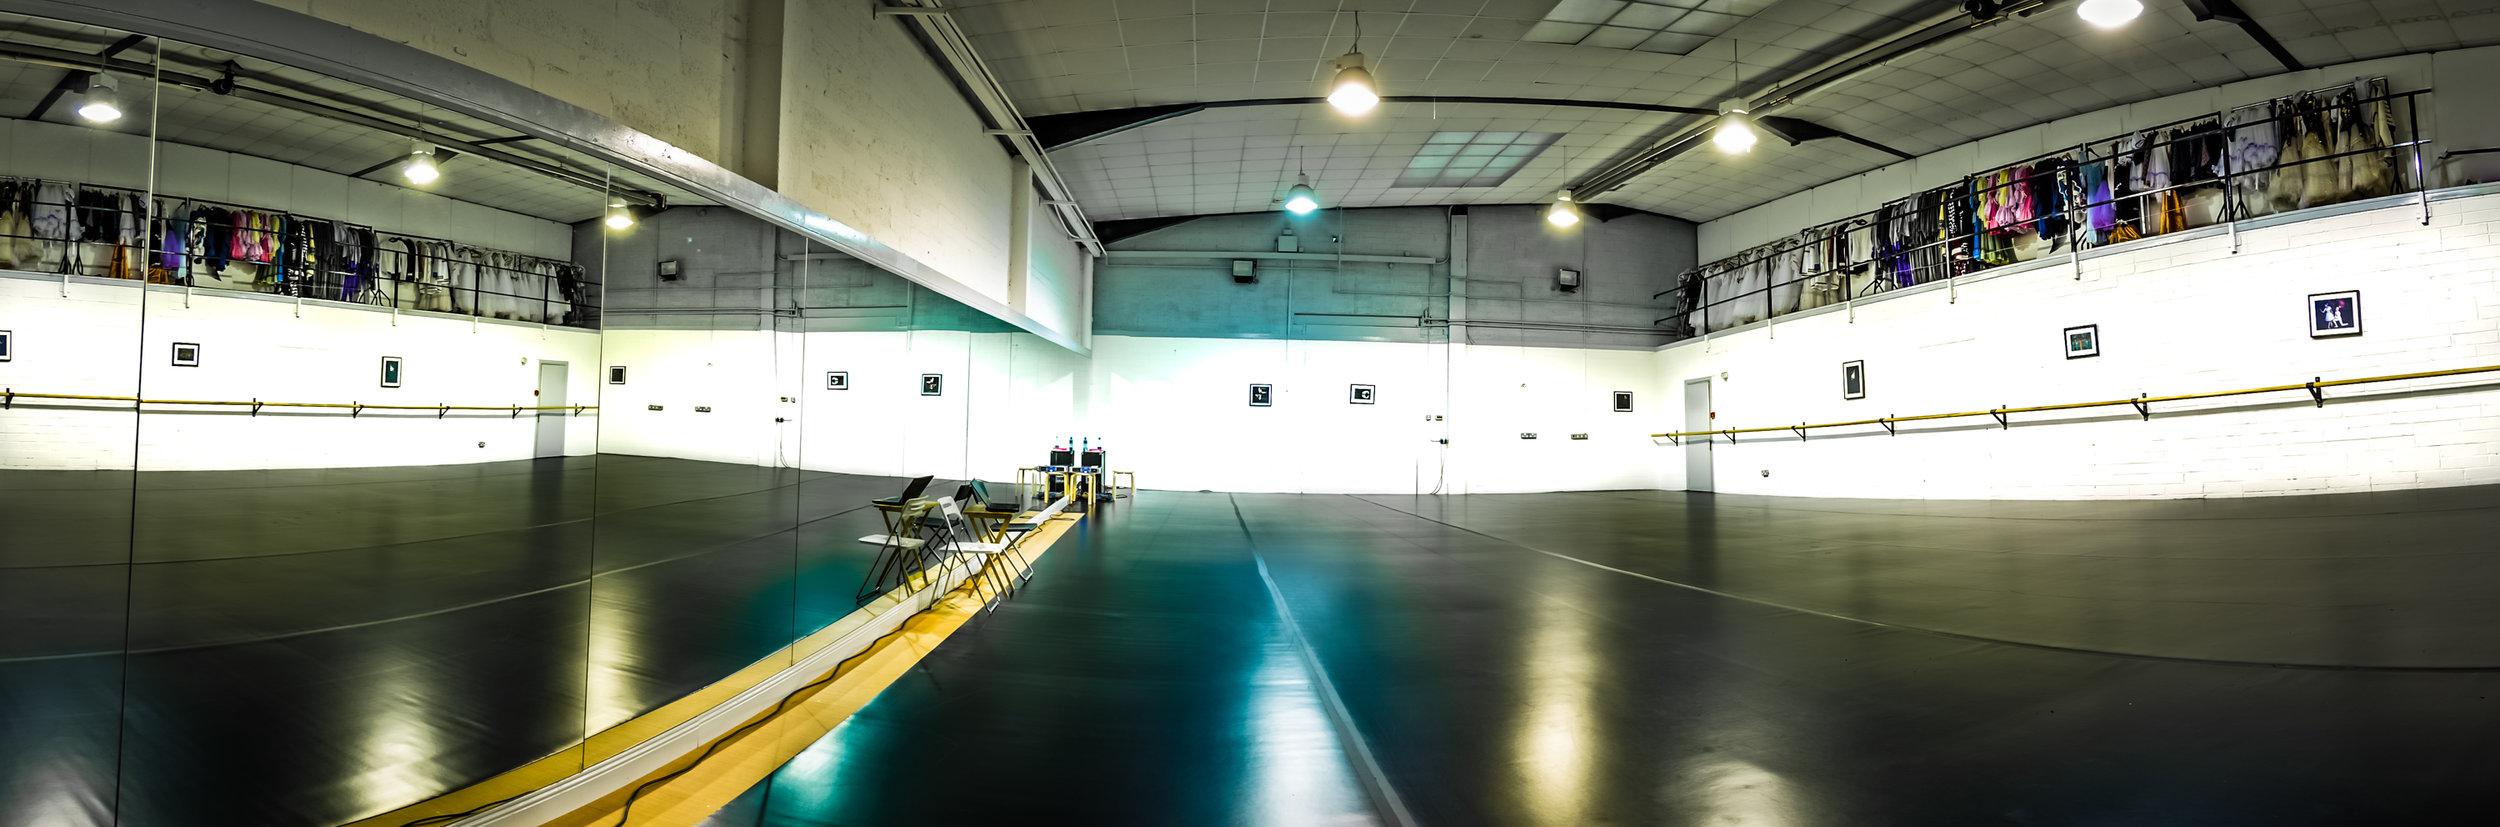 Monica Loughman Dance studio-30.jpg